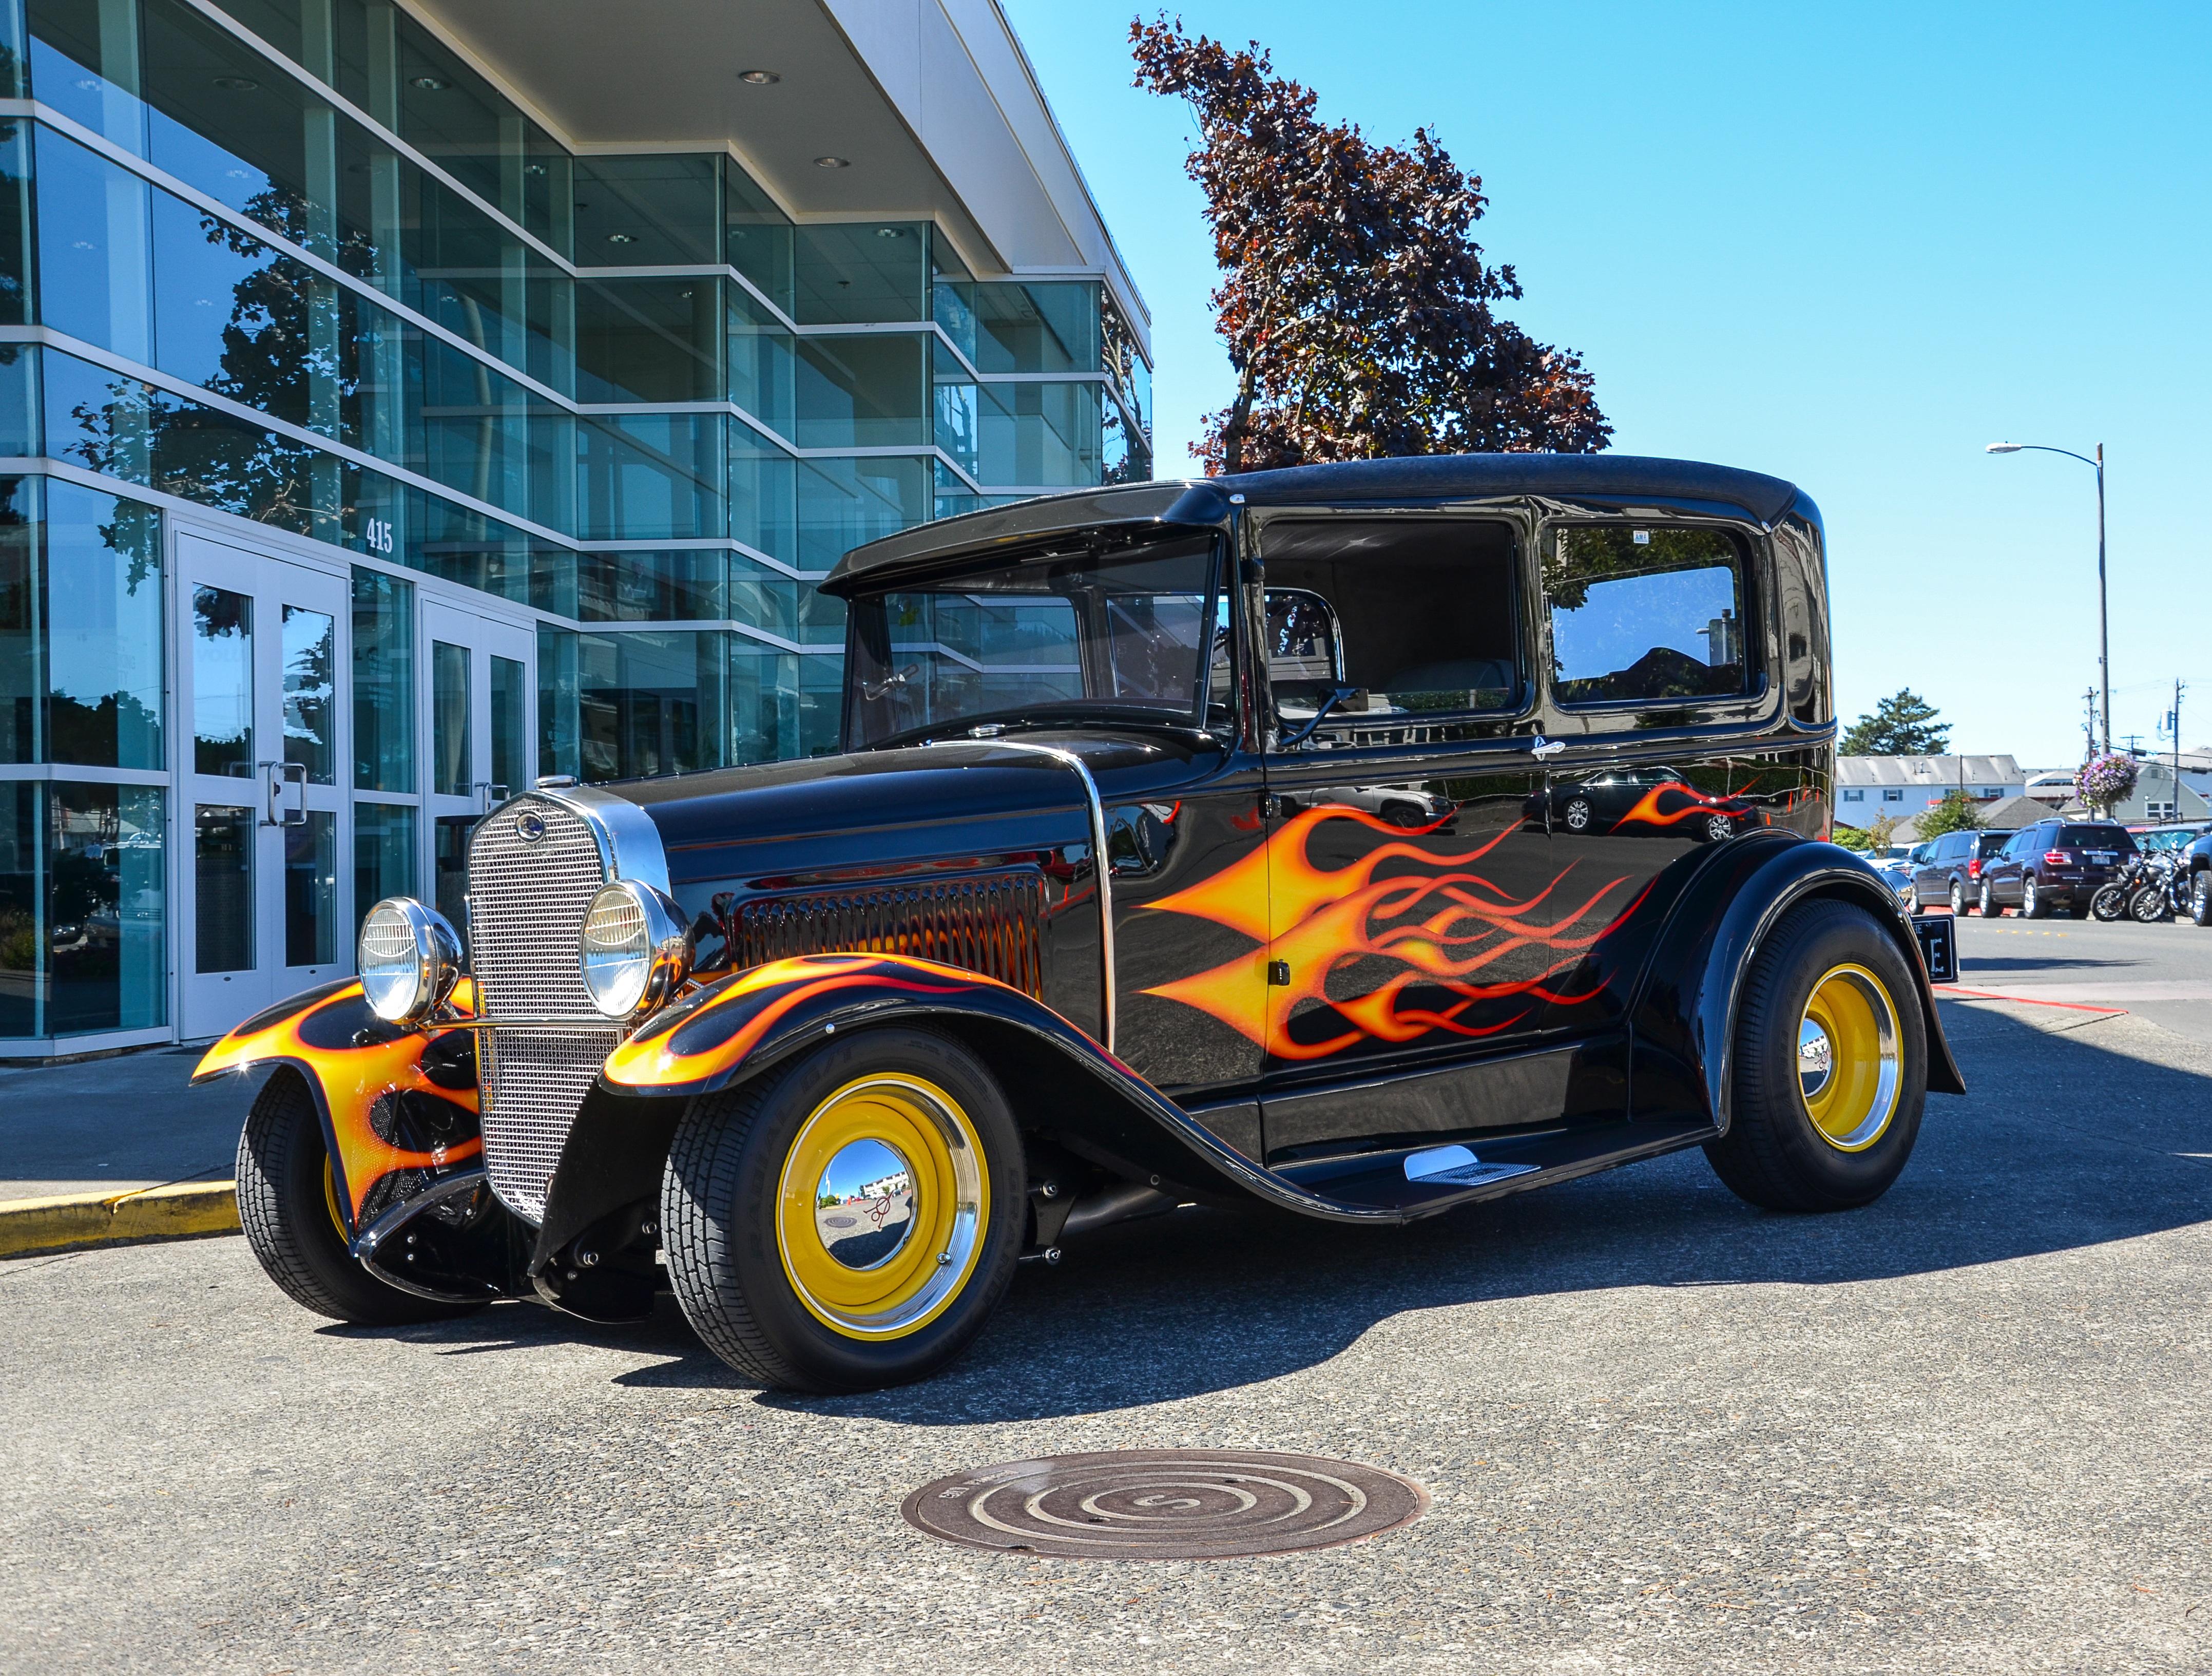 Free Images : seaside, usa, america, old car, automotive, motor ...